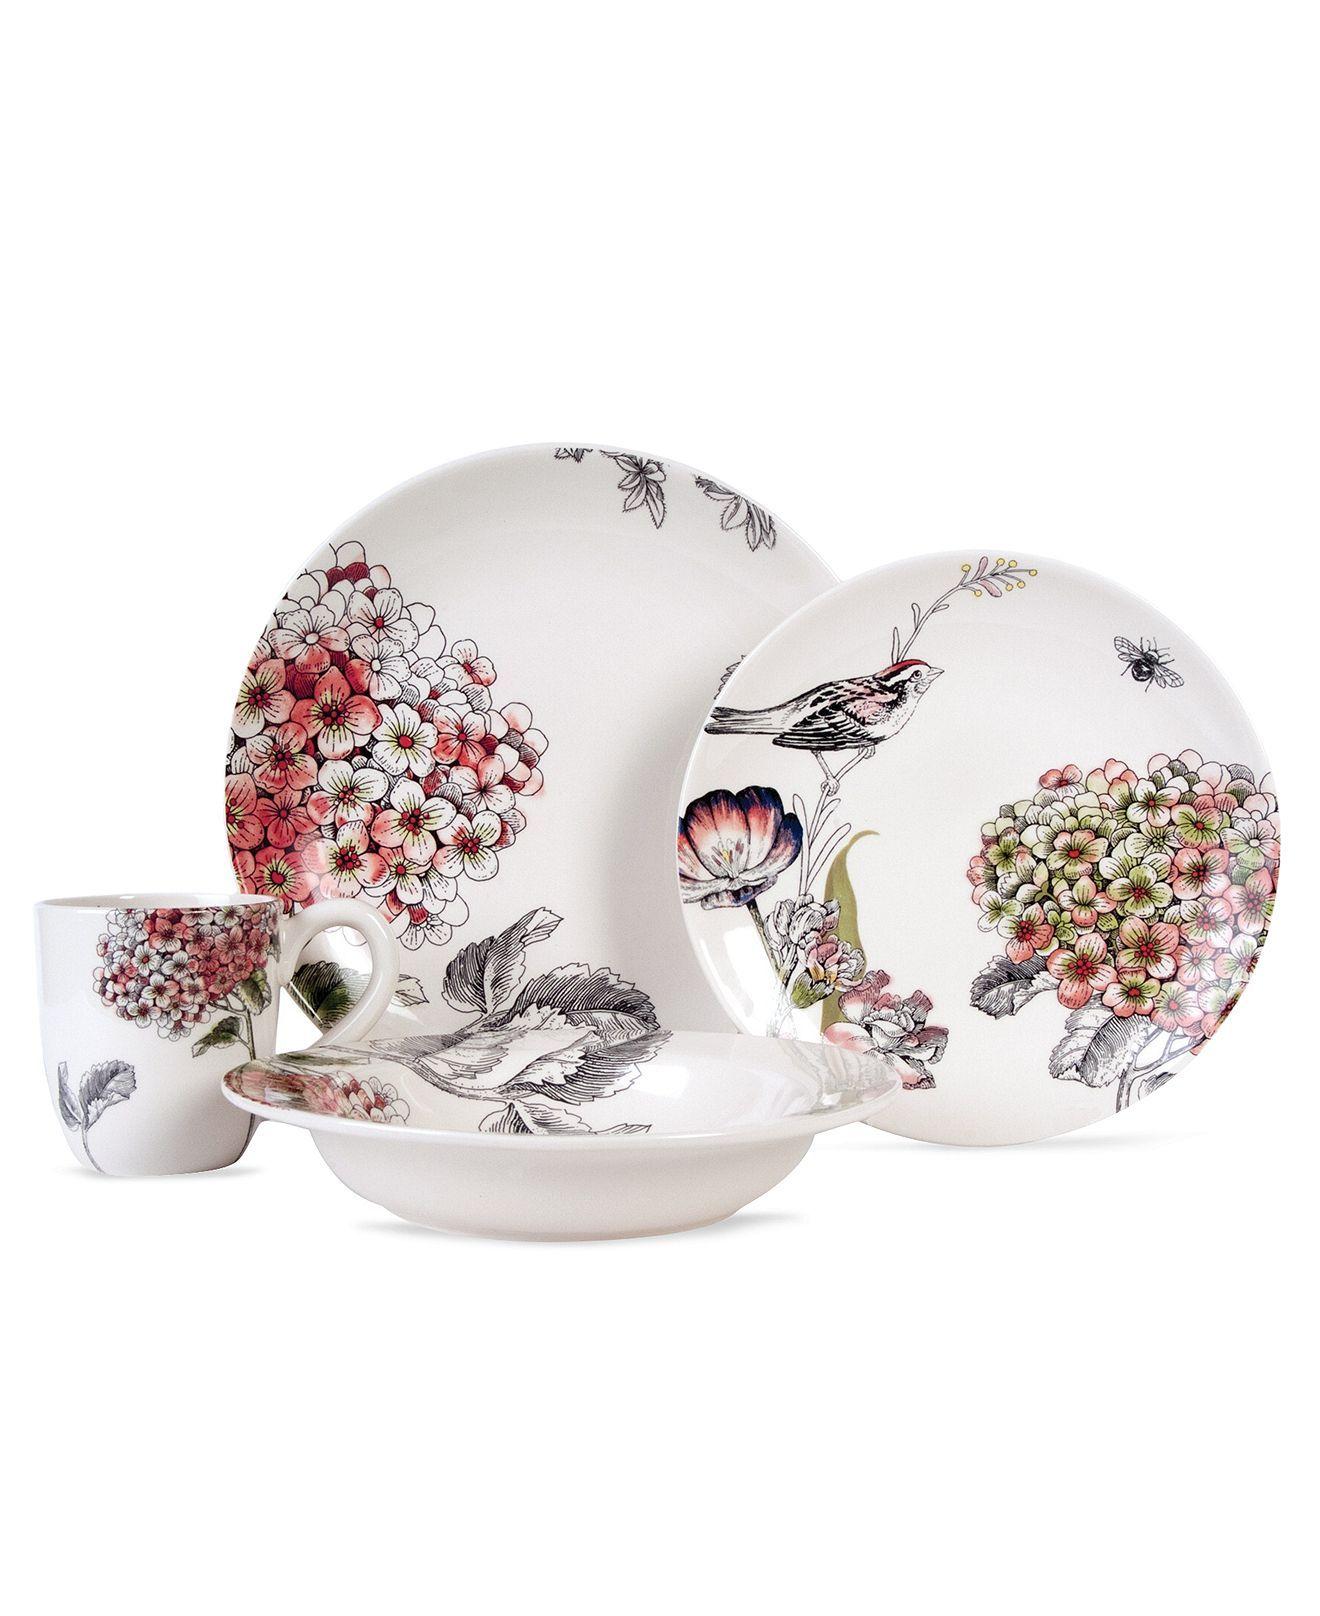 edie rose by rachel bilson dinnerware hydrangea 4 piece place setting casual dinnerware